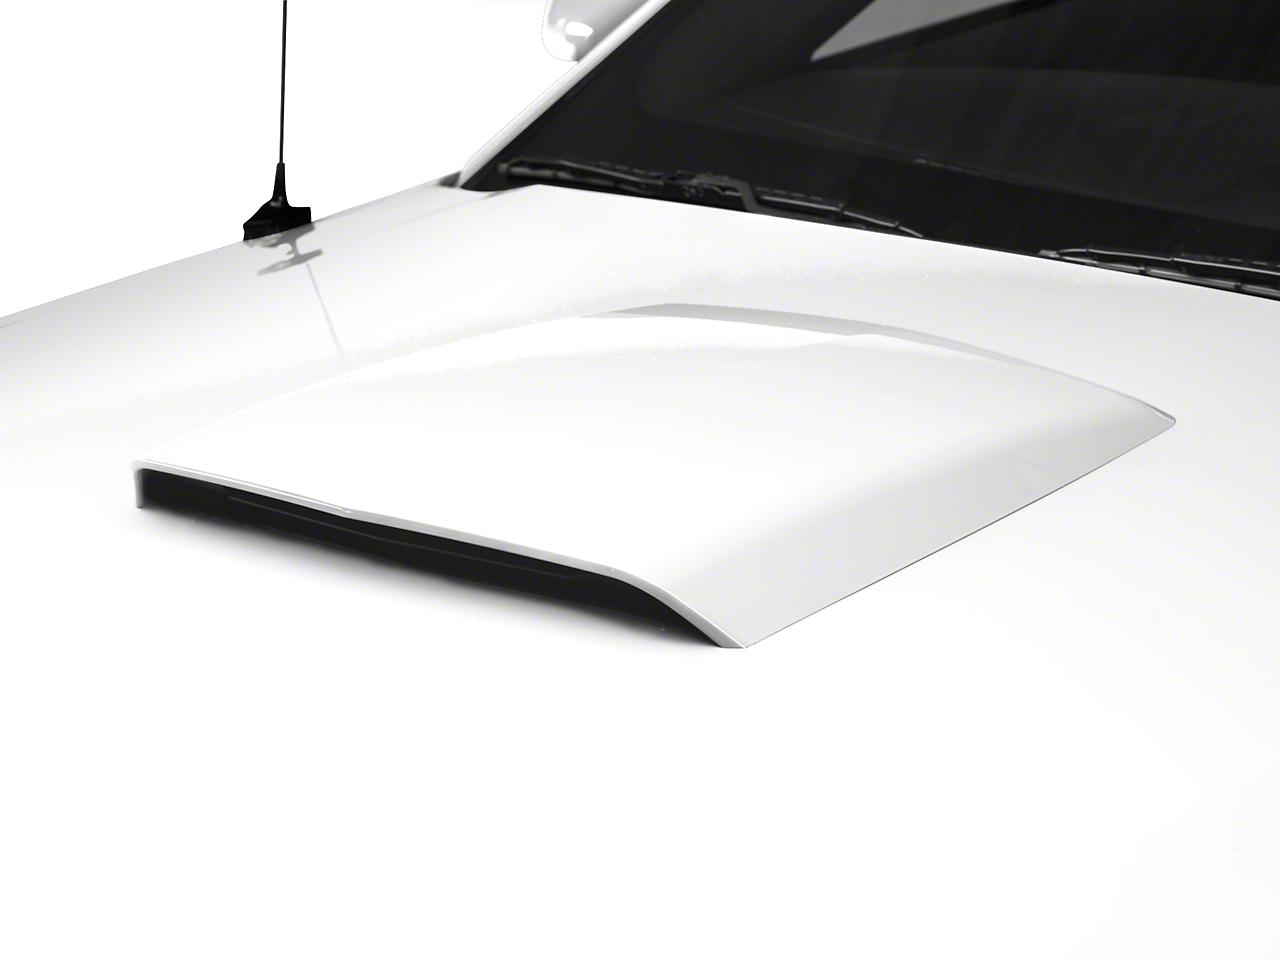 MMD Hood Scoop - Unpainted (05-09 GT, V6)